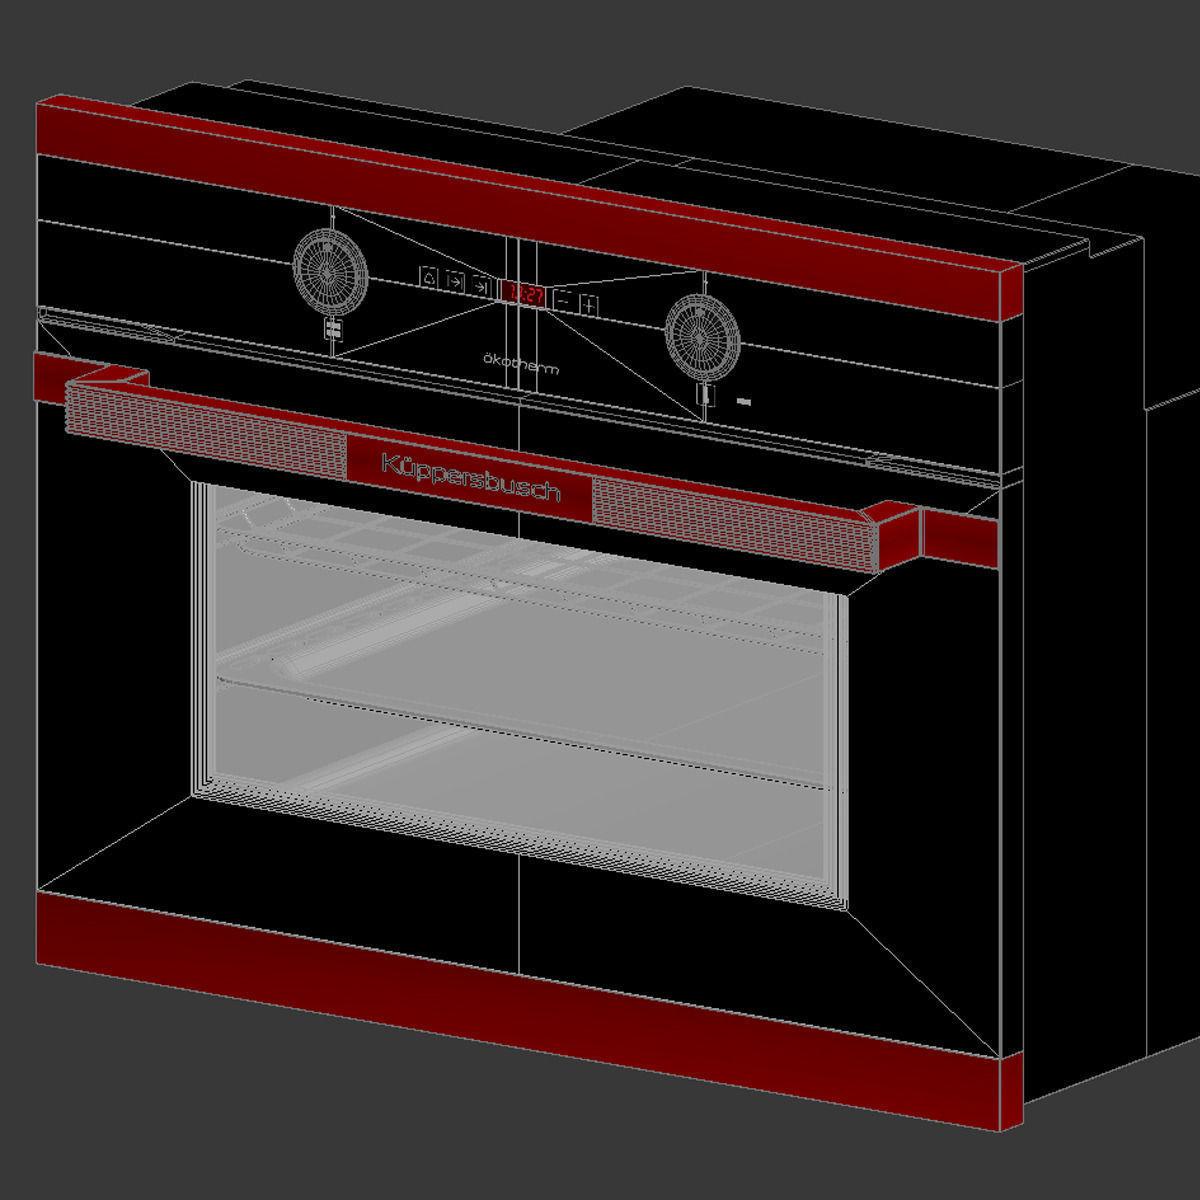 kuppersbusch eeb 6260 jxr compact oven 3d model max. Black Bedroom Furniture Sets. Home Design Ideas